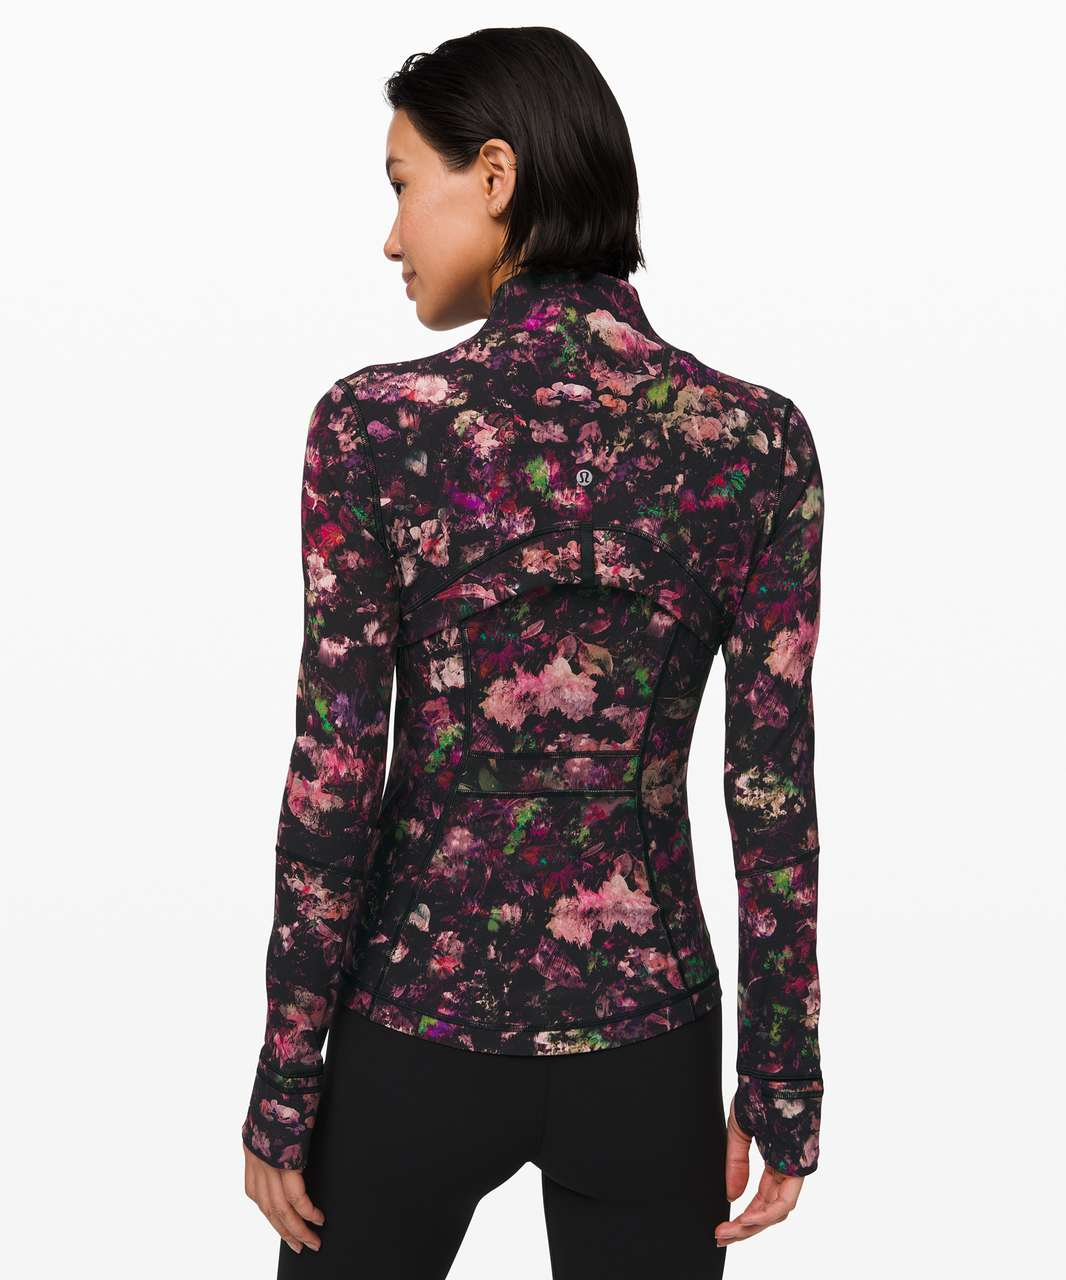 Lululemon Define Jacket *Luxtreme - Floral Illusion Antique White Multi